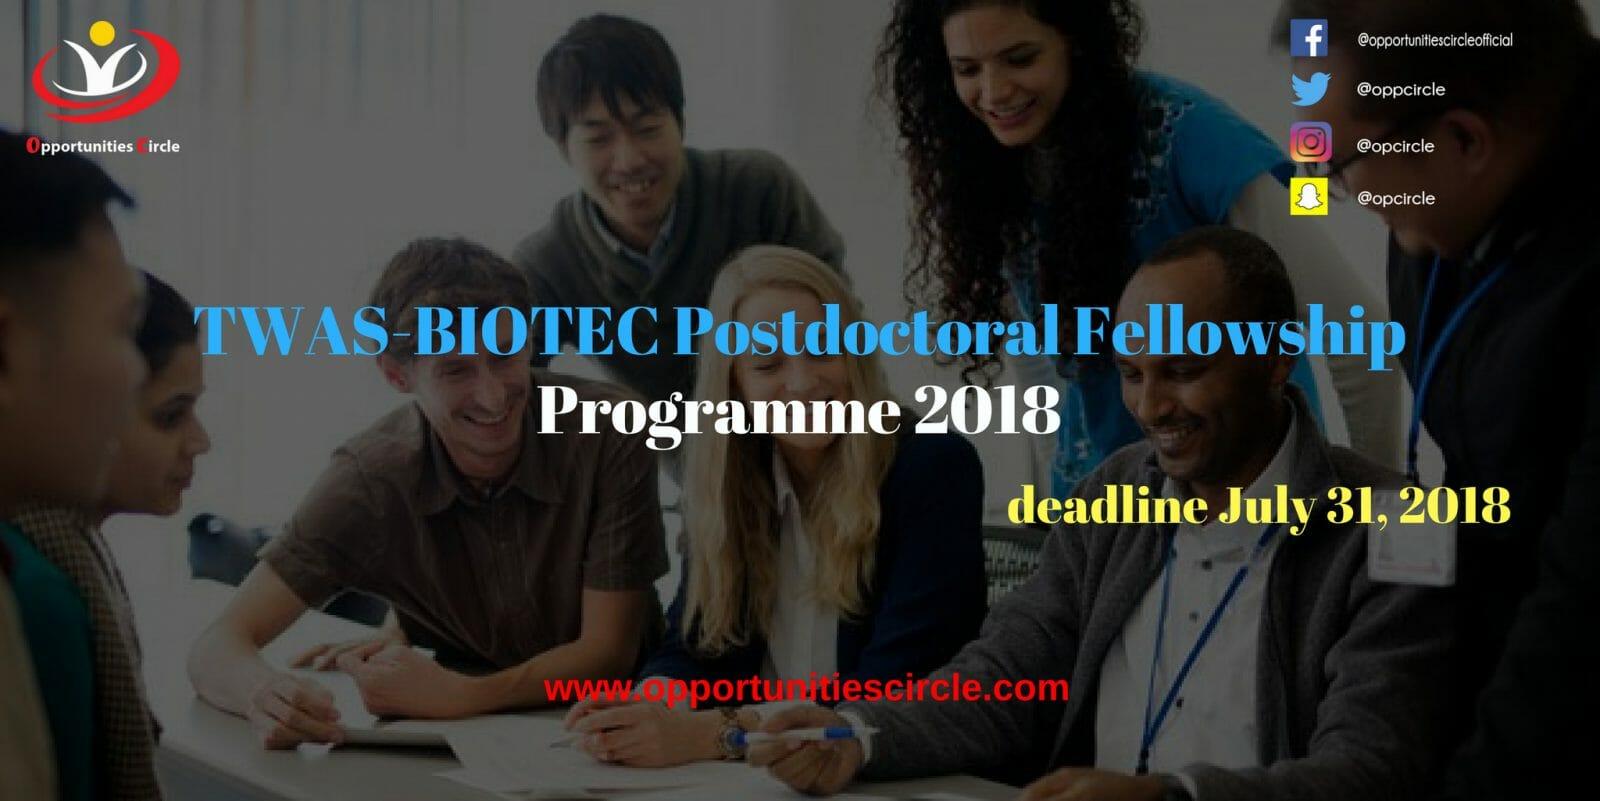 TWAS BIOTEC Postdoctoral Fellowship Programme 2018 - TWAS-BIOTEC Postdoctoral Fellowship Programme 2018